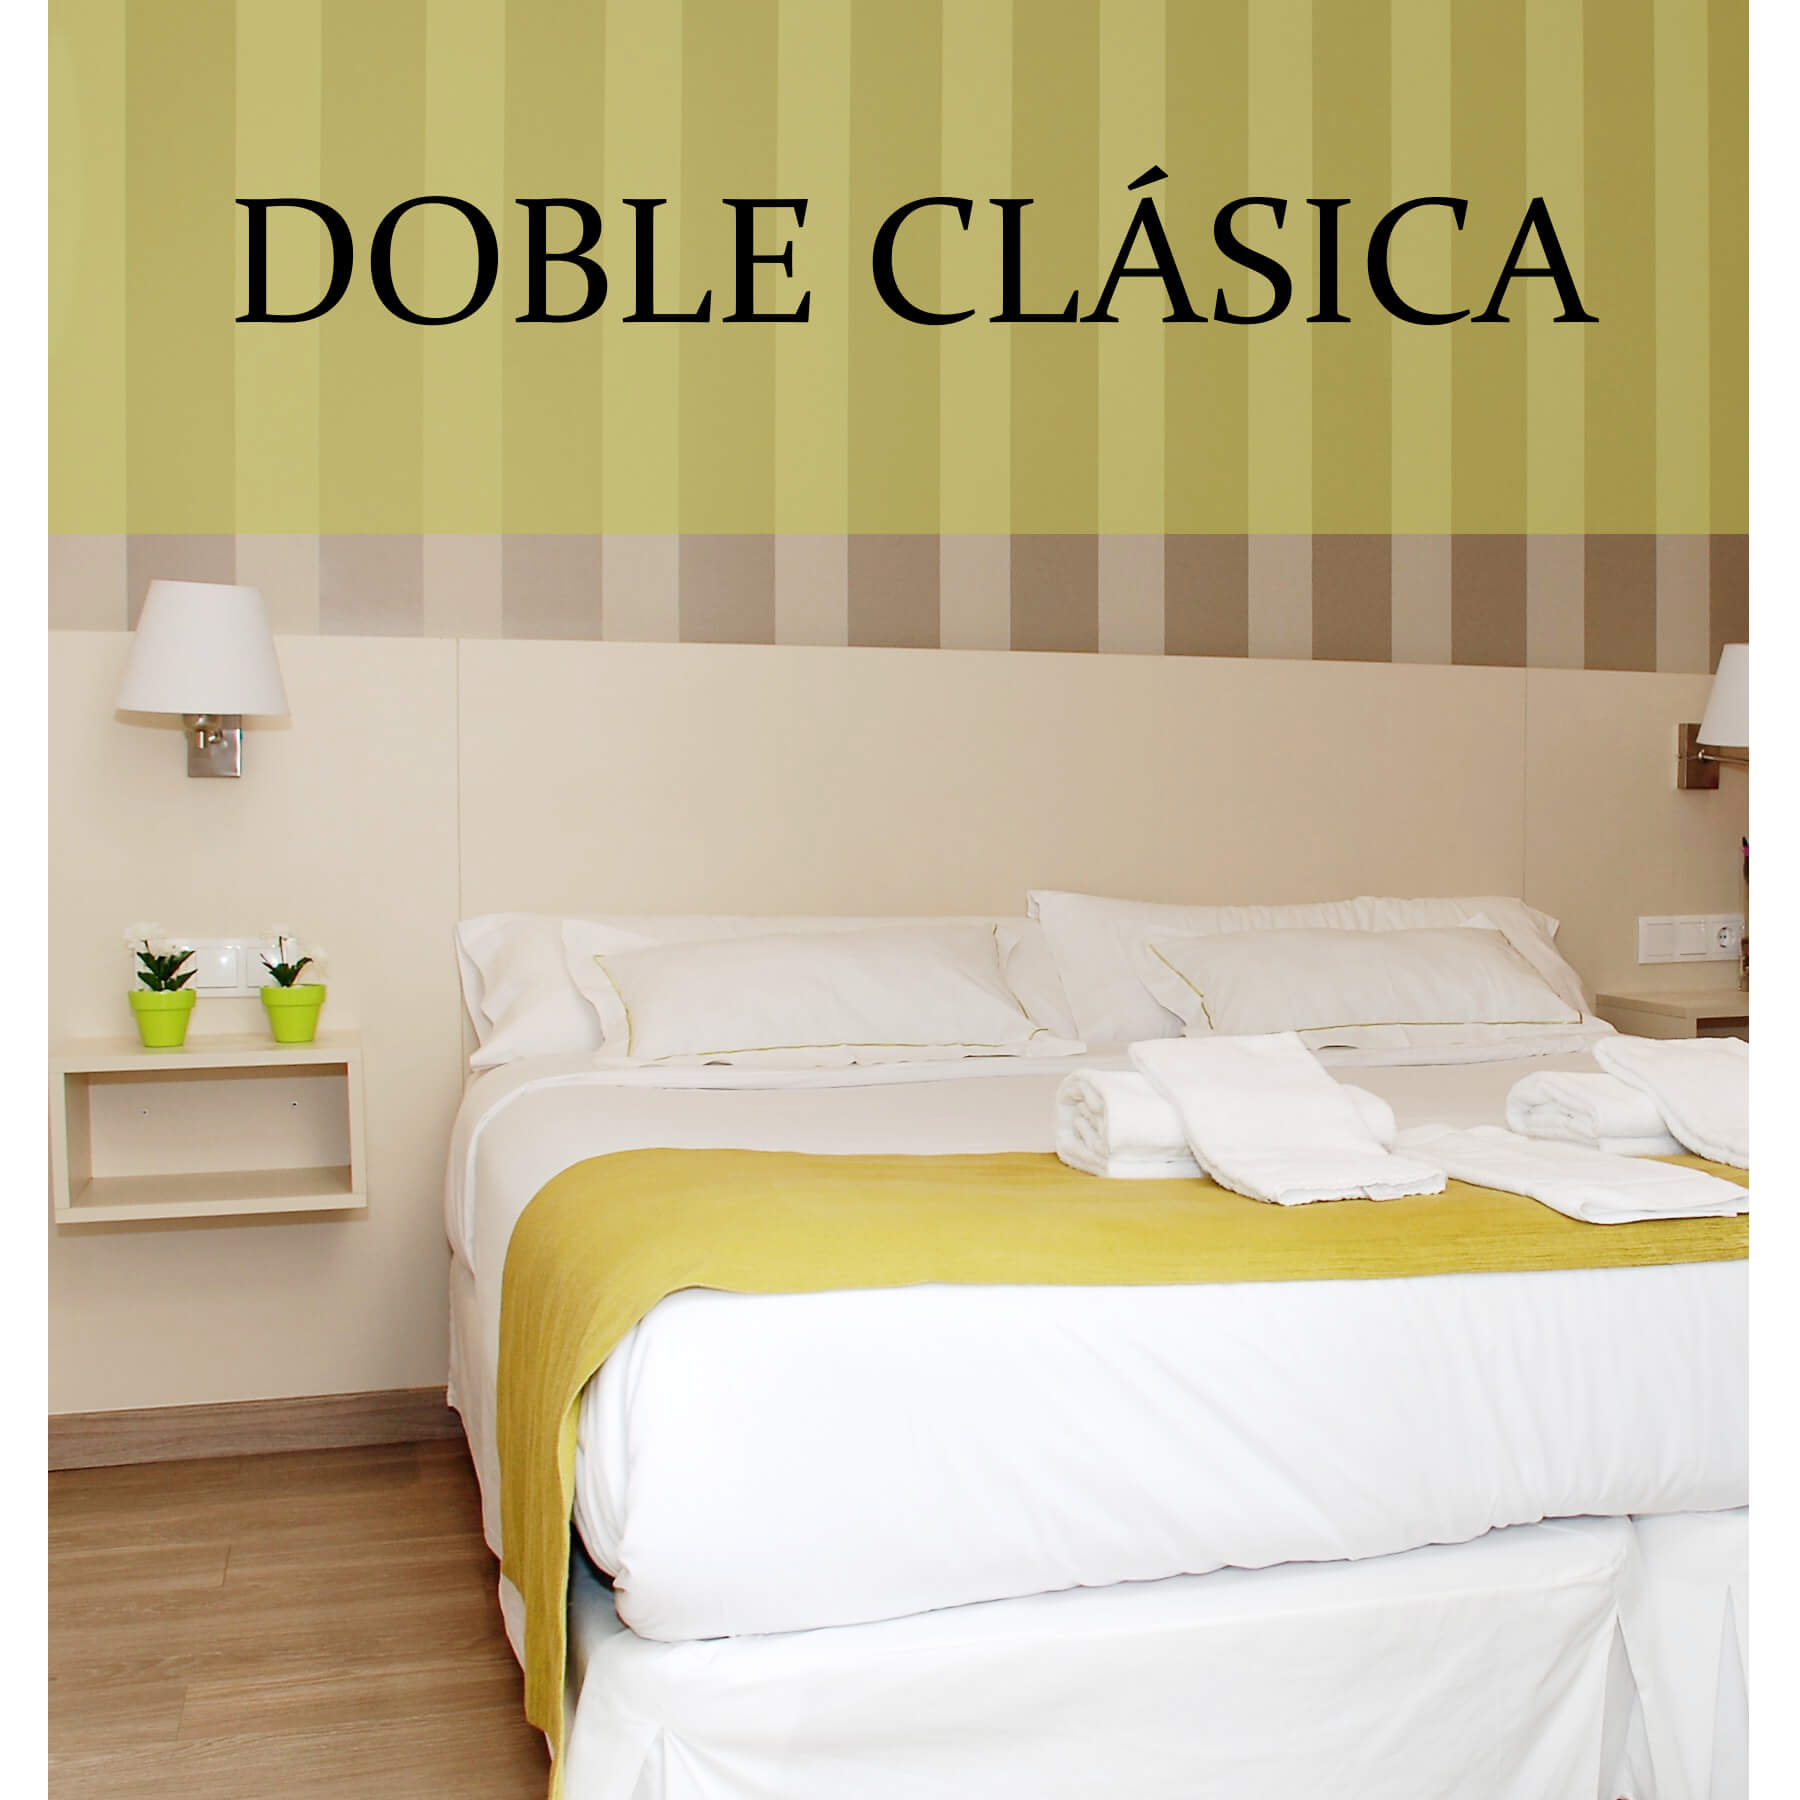 Habitación doble clásica